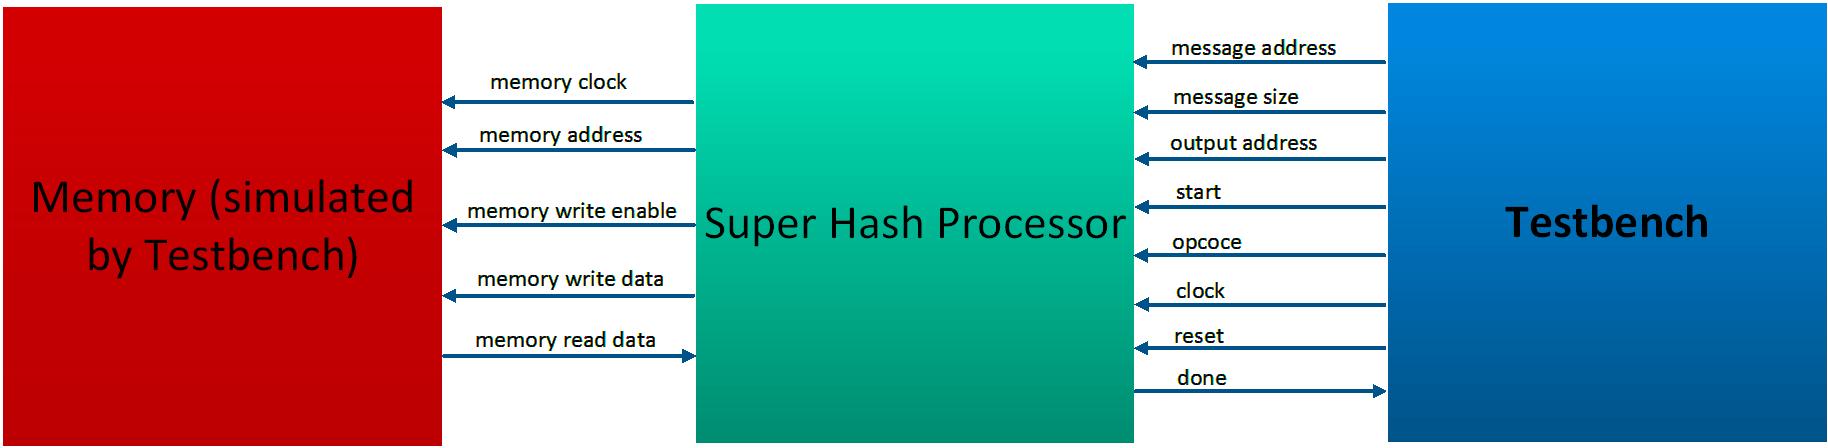 Altera FPGA Based Super Hash Processor Design | Artin Isagholian